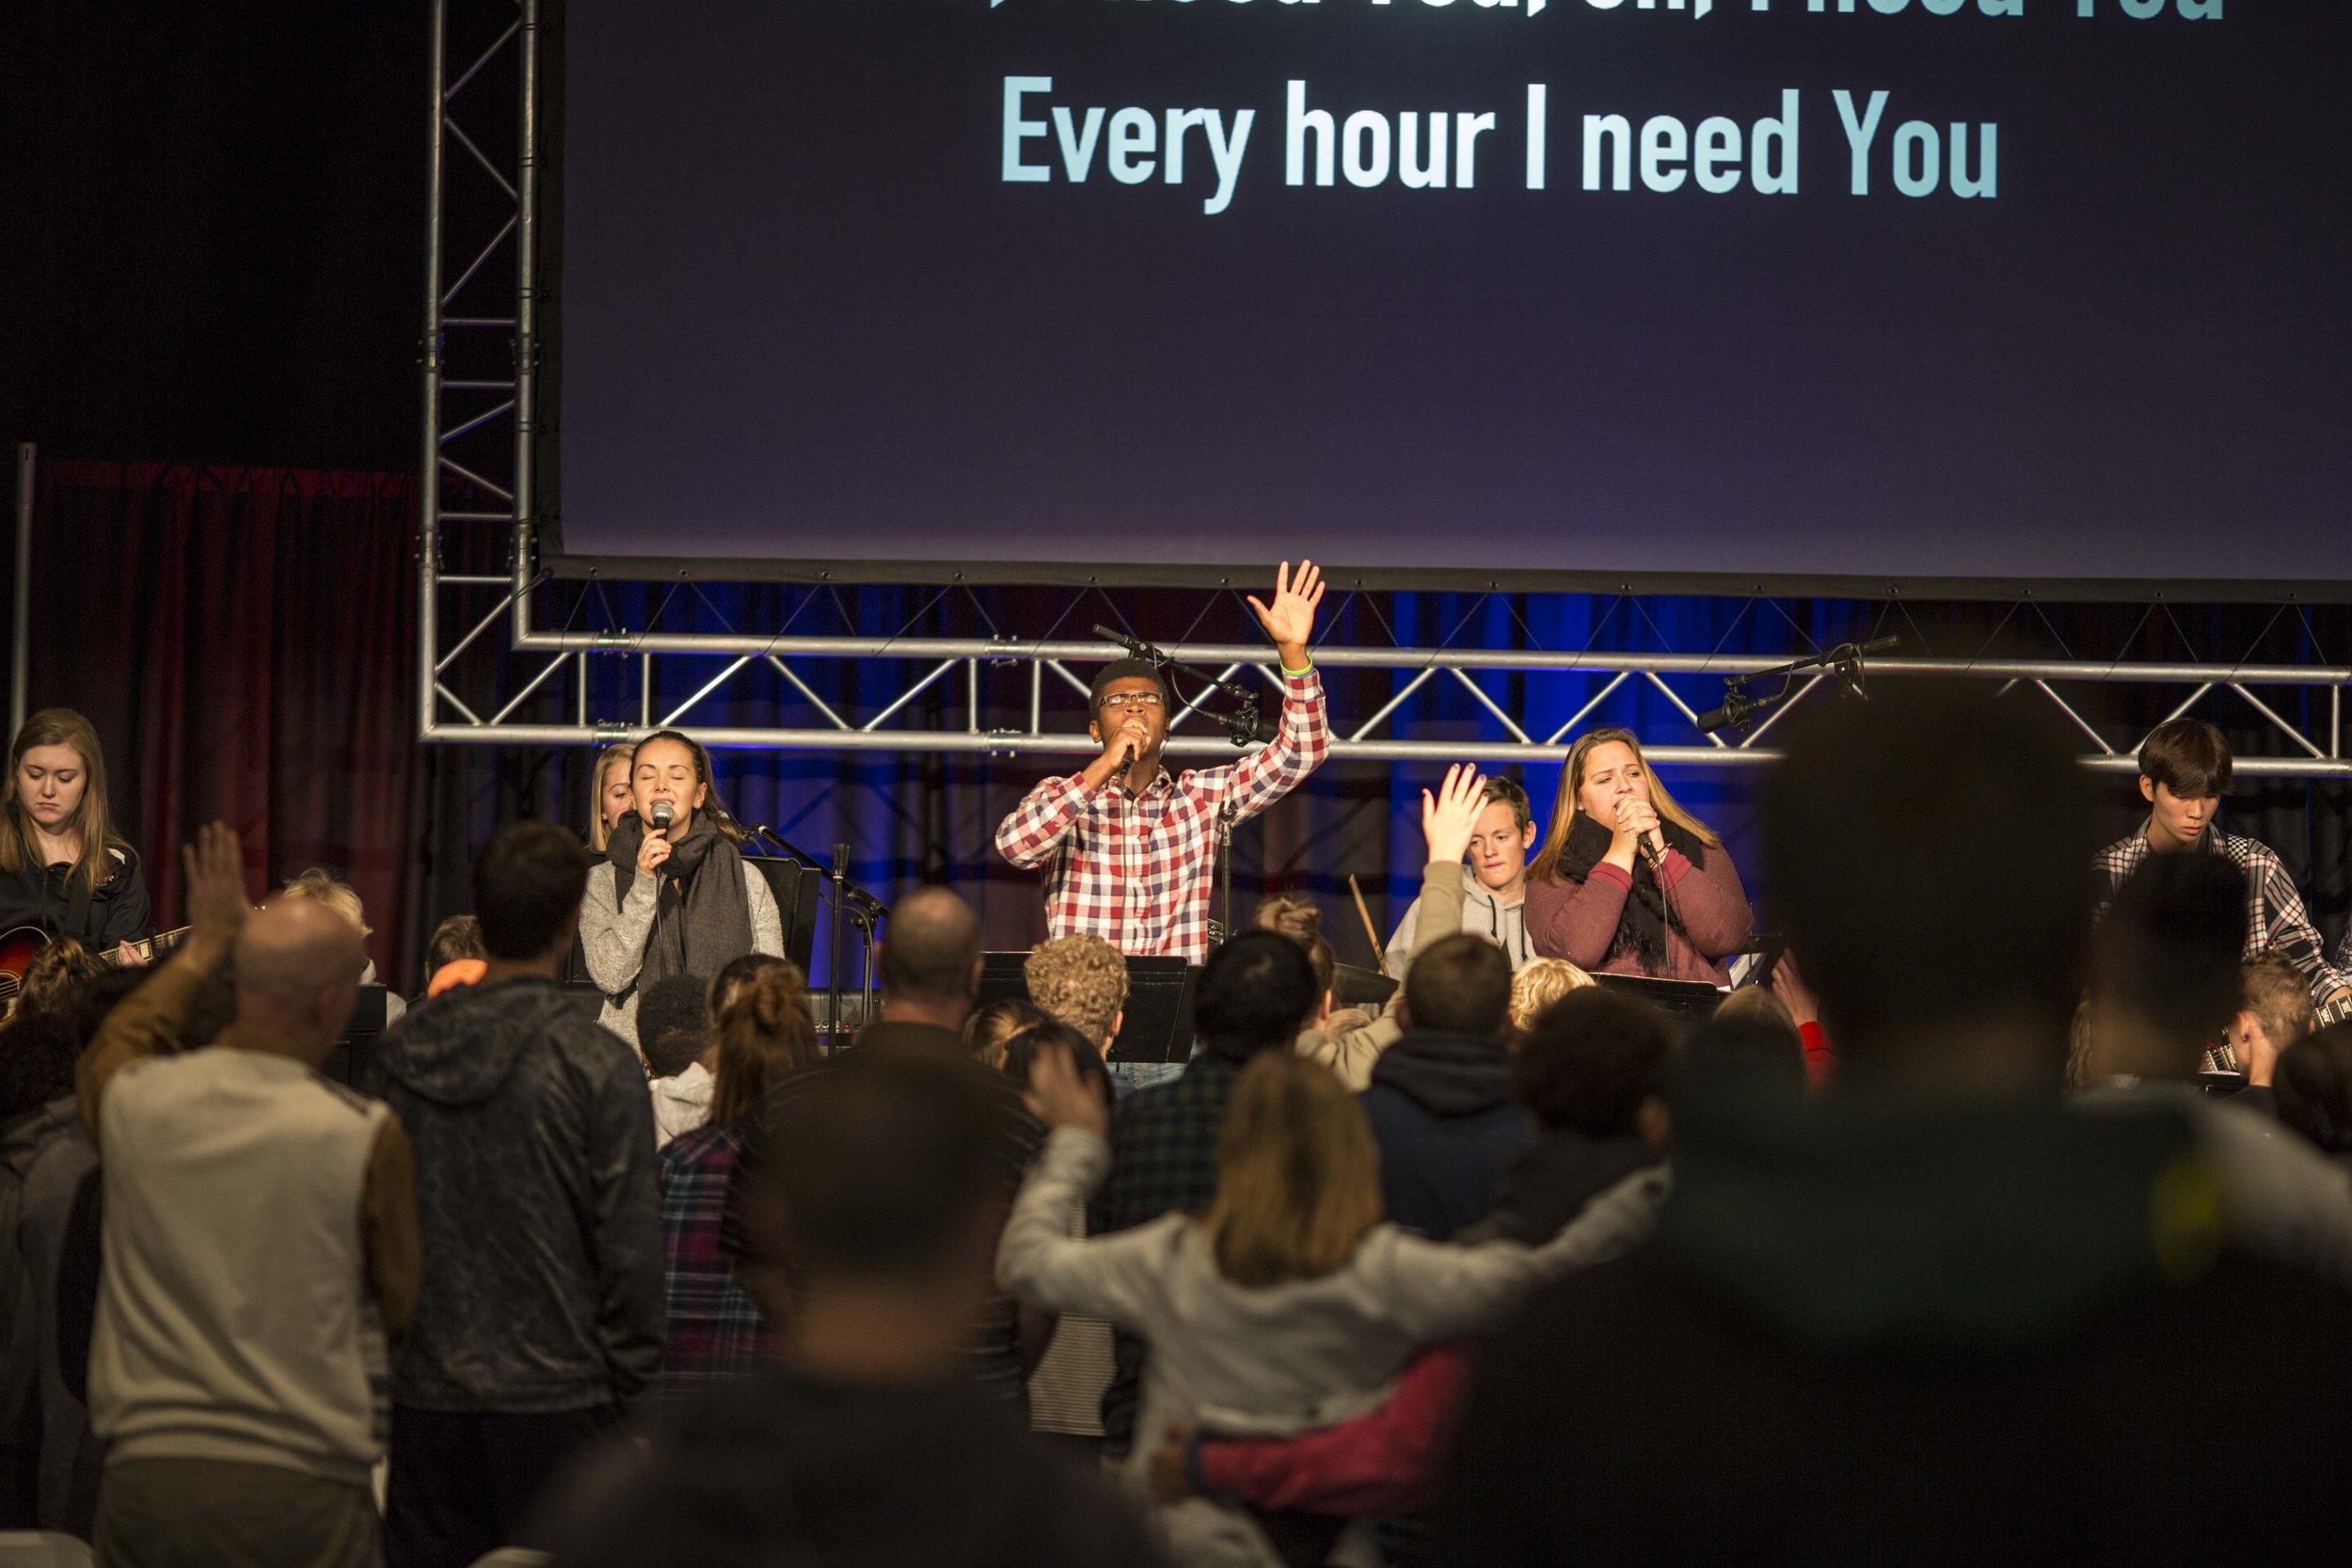 Sam Ihrke leads the Praise Team during the Prayer Day worship set